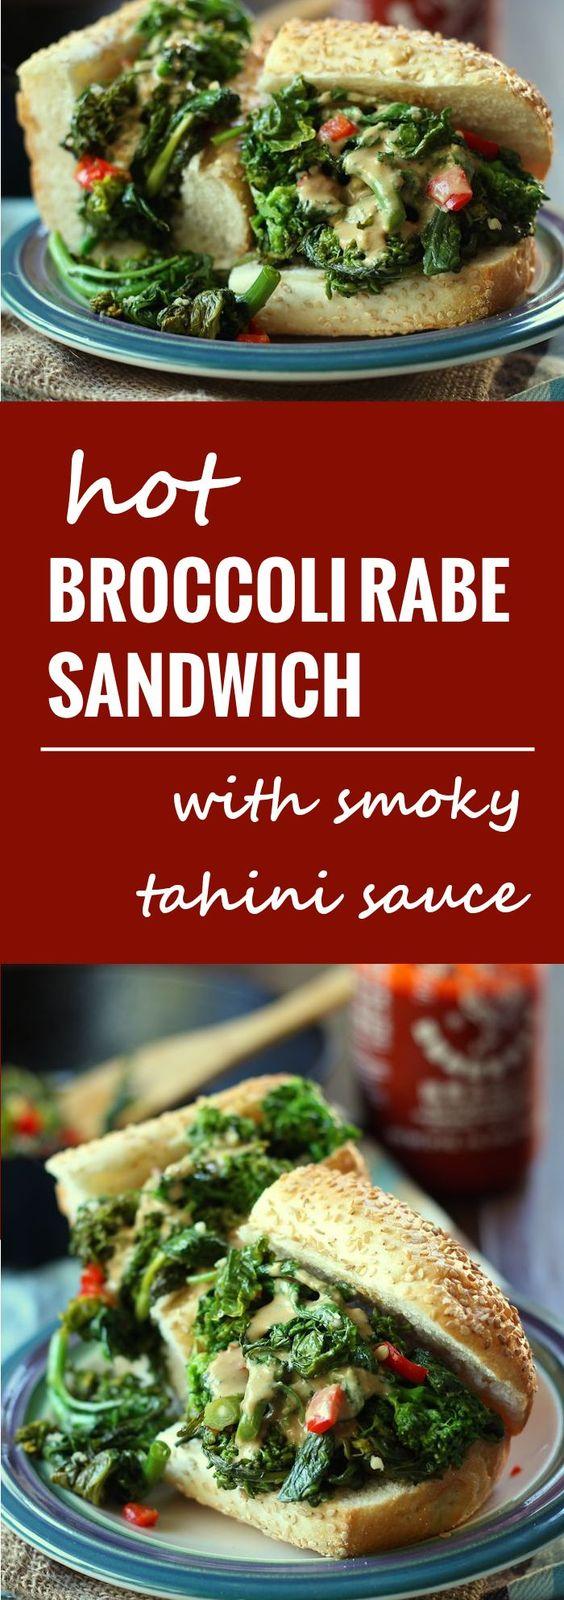 broccoli rabe lasagna stir fried broccoli rabe roasted broccoli rabe ...